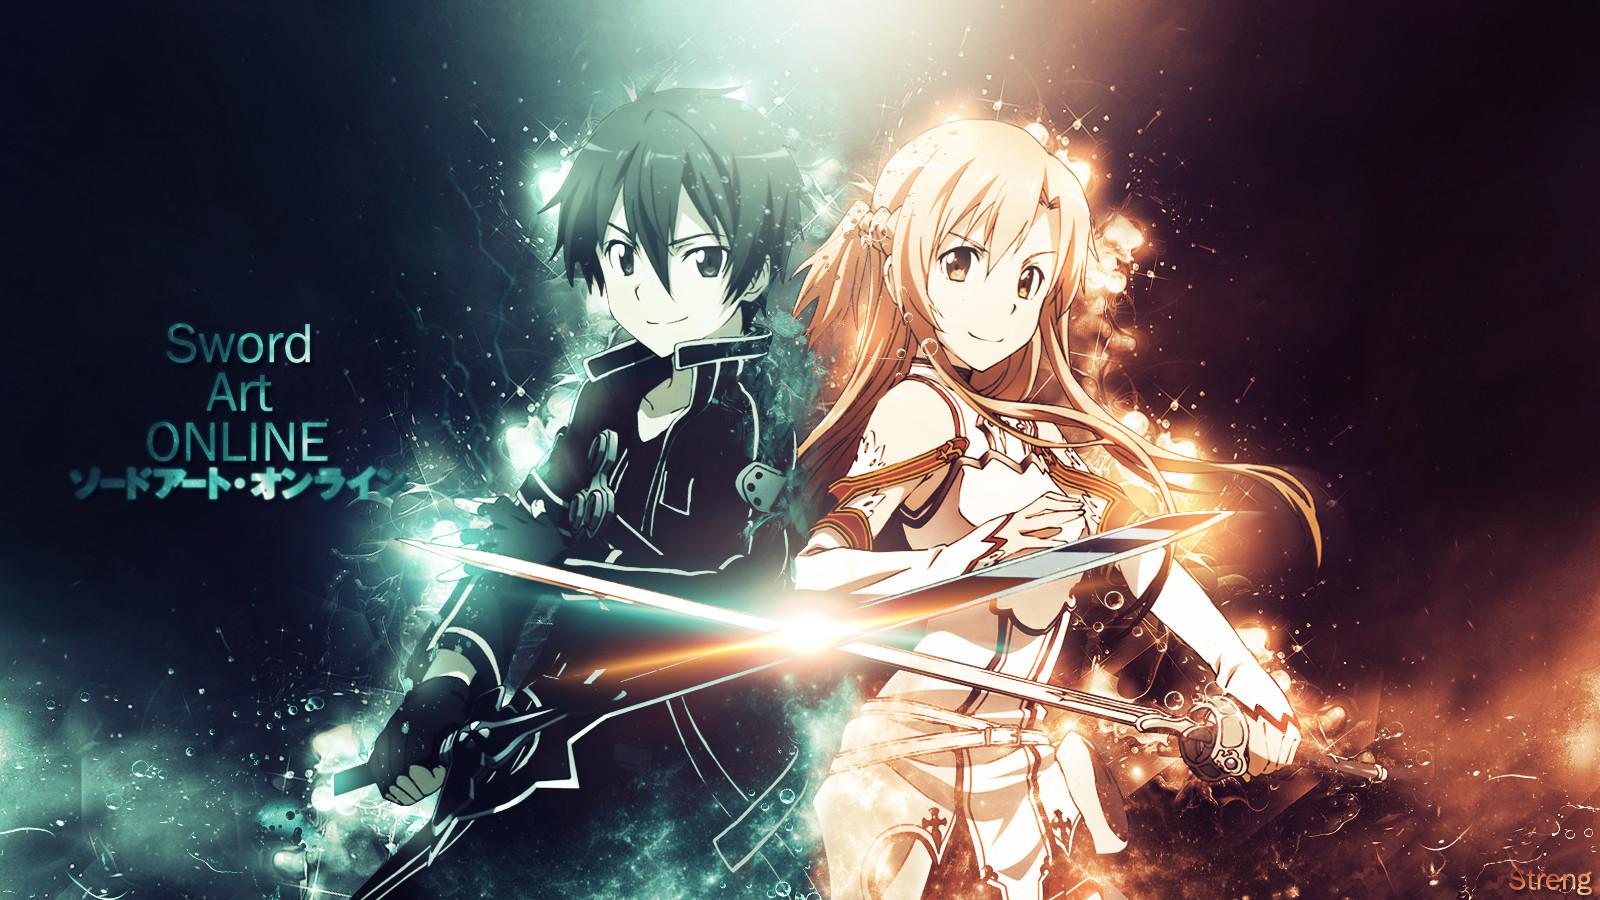 Sword Art Online Season 2 5 Wide Wallpaper Animewp Com